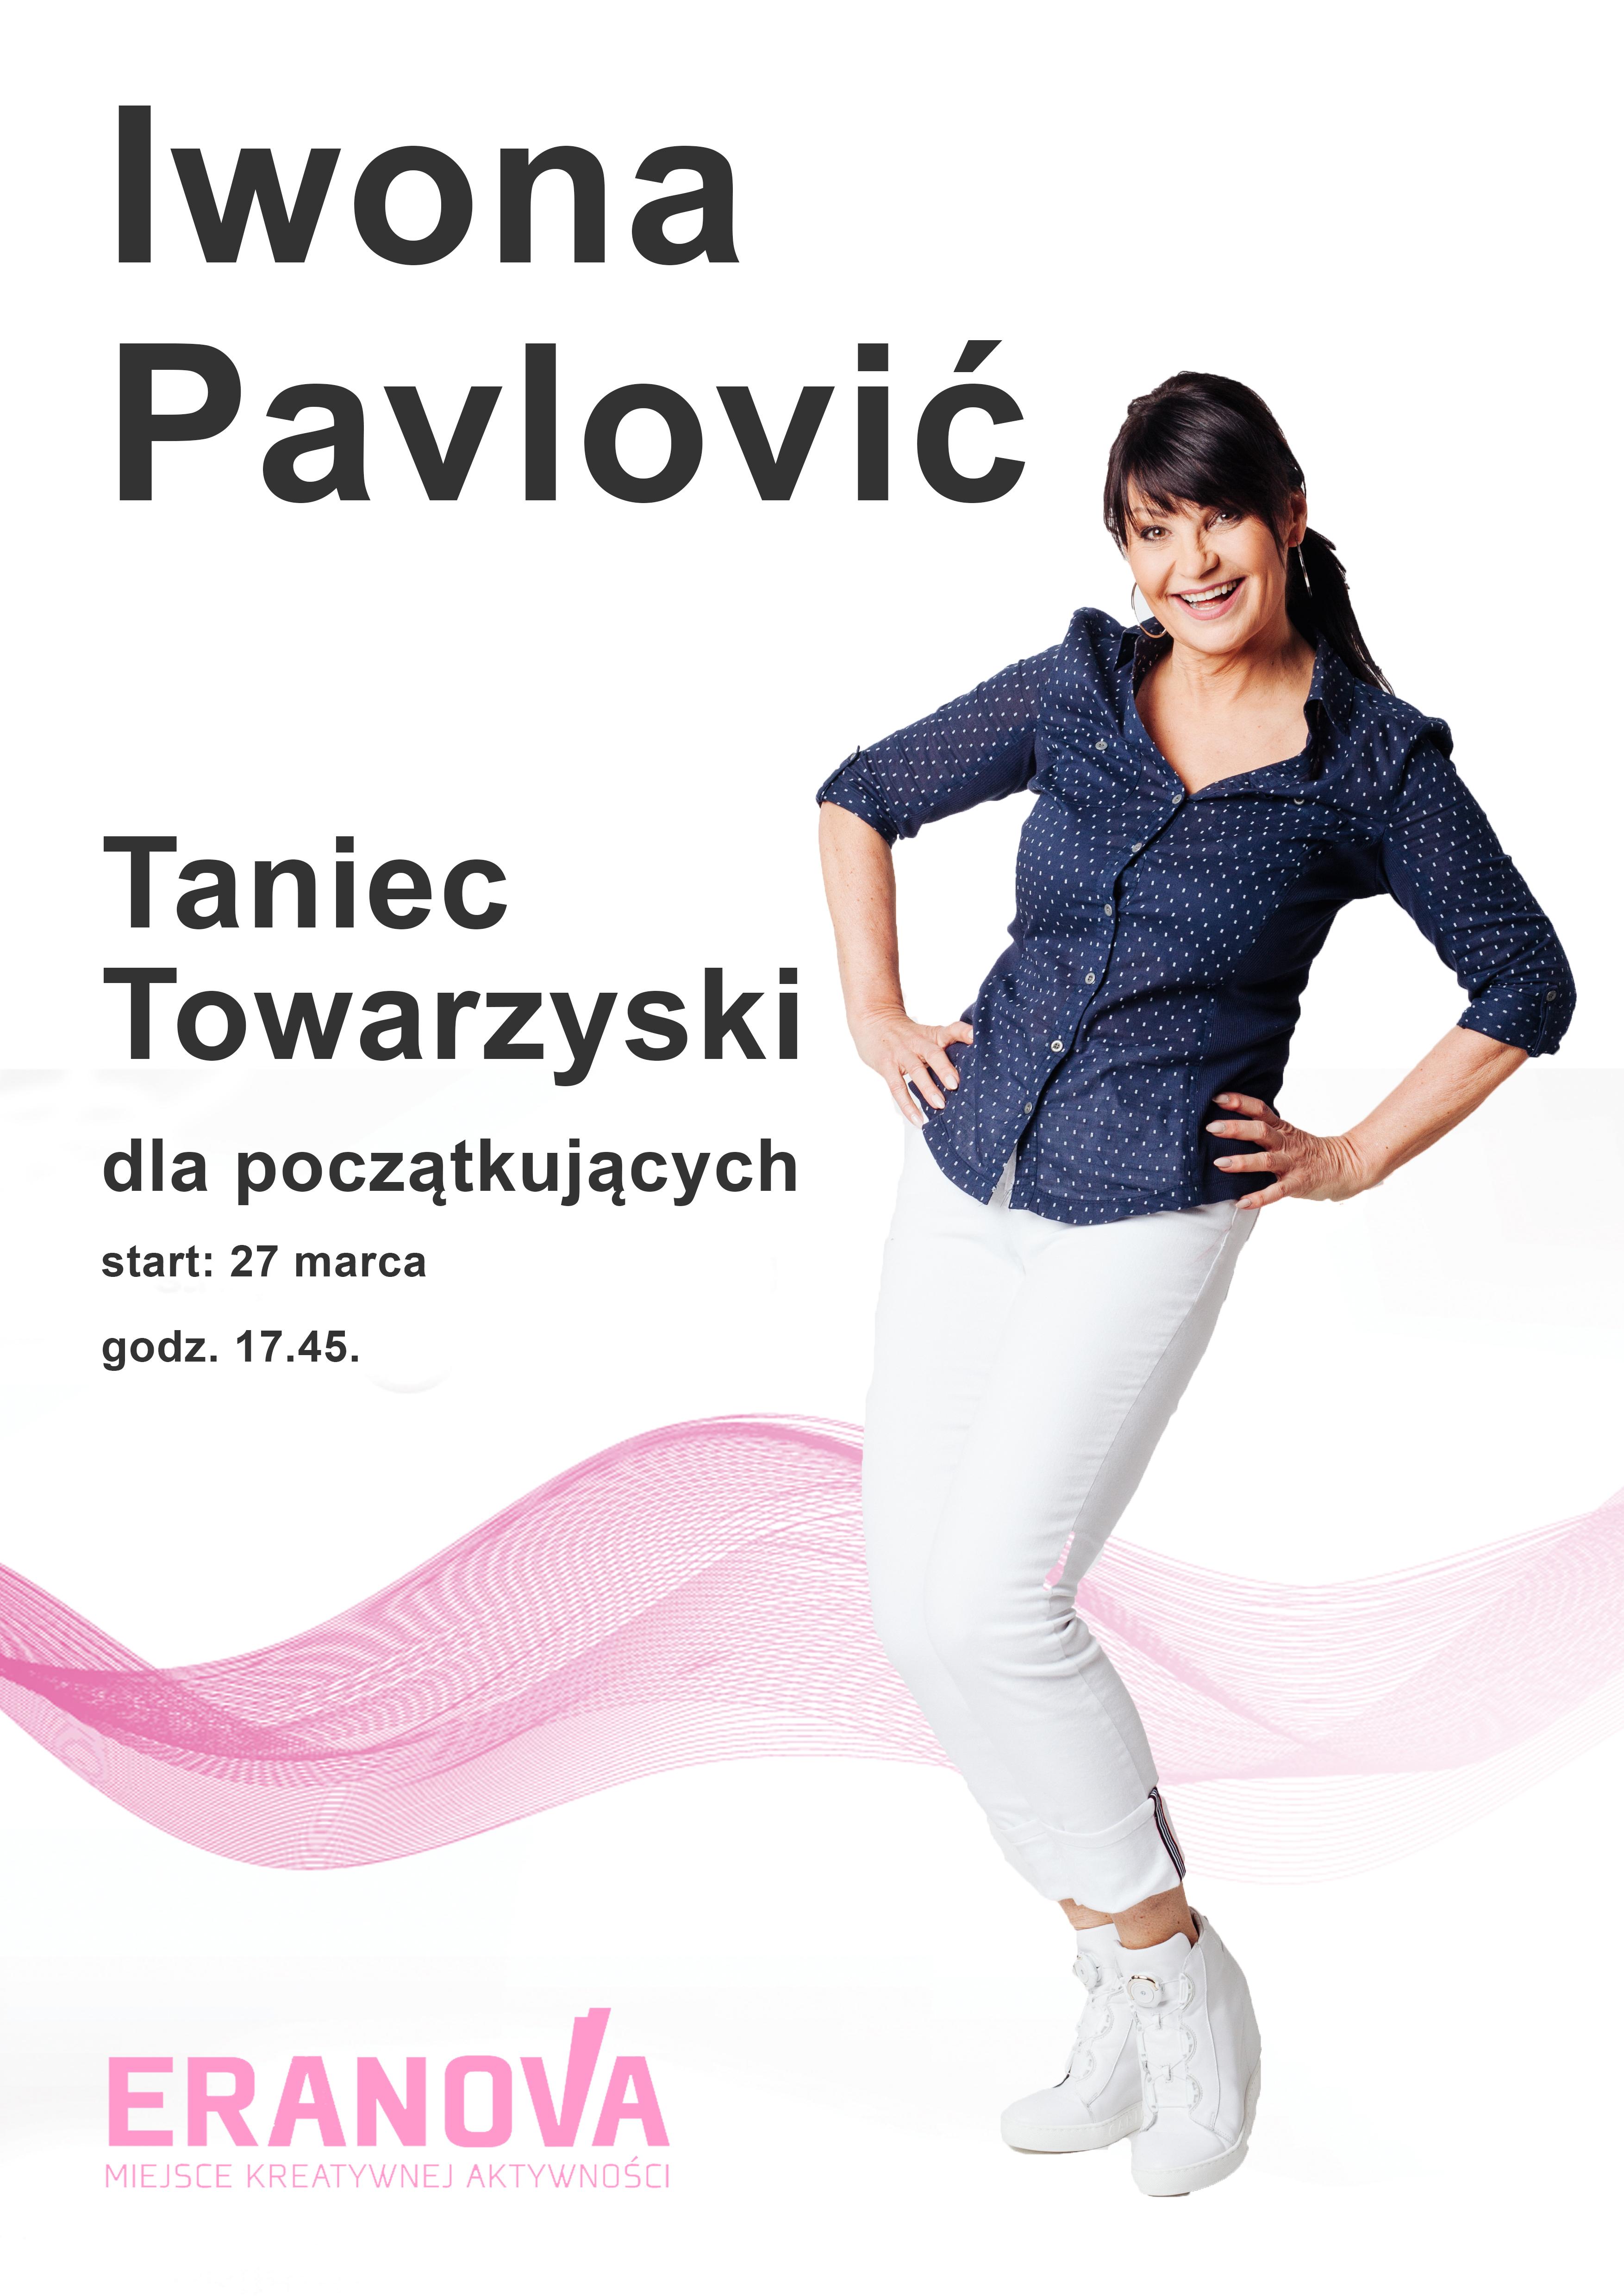 http://m.eranova.pl/2019/03/orig/iwona-pavlovic-2954.jpg